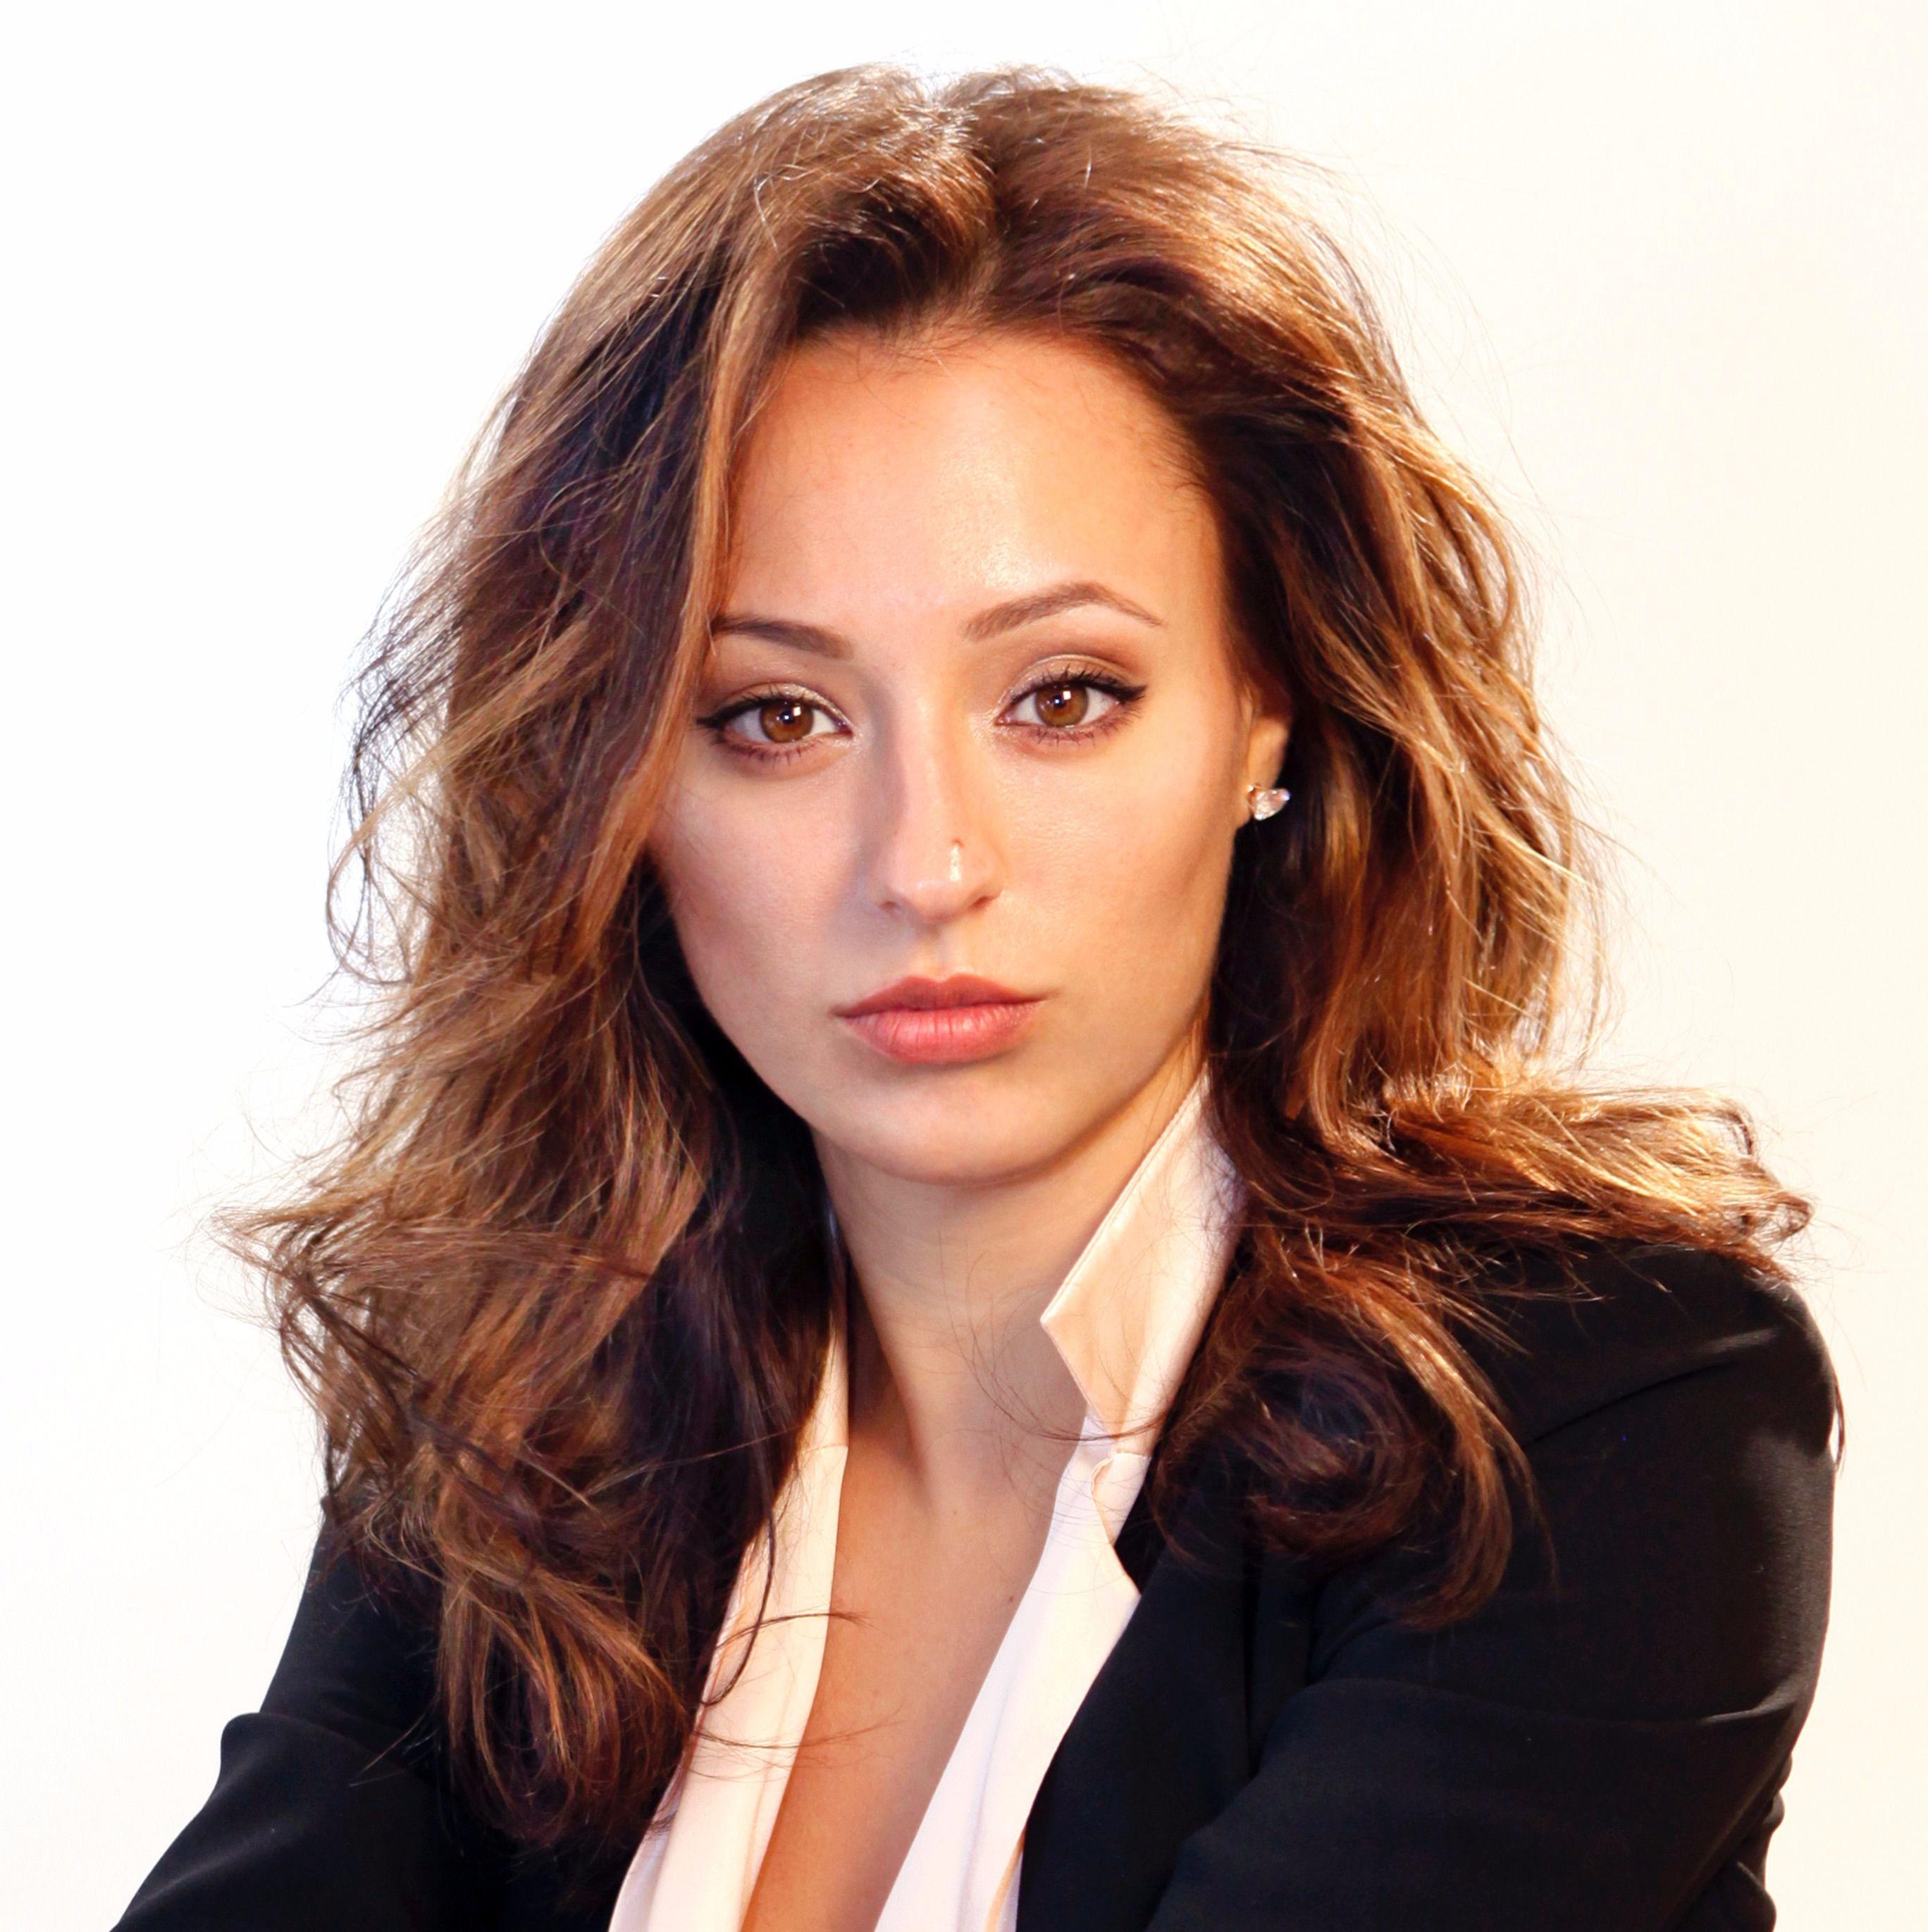 Sonya Kreizman